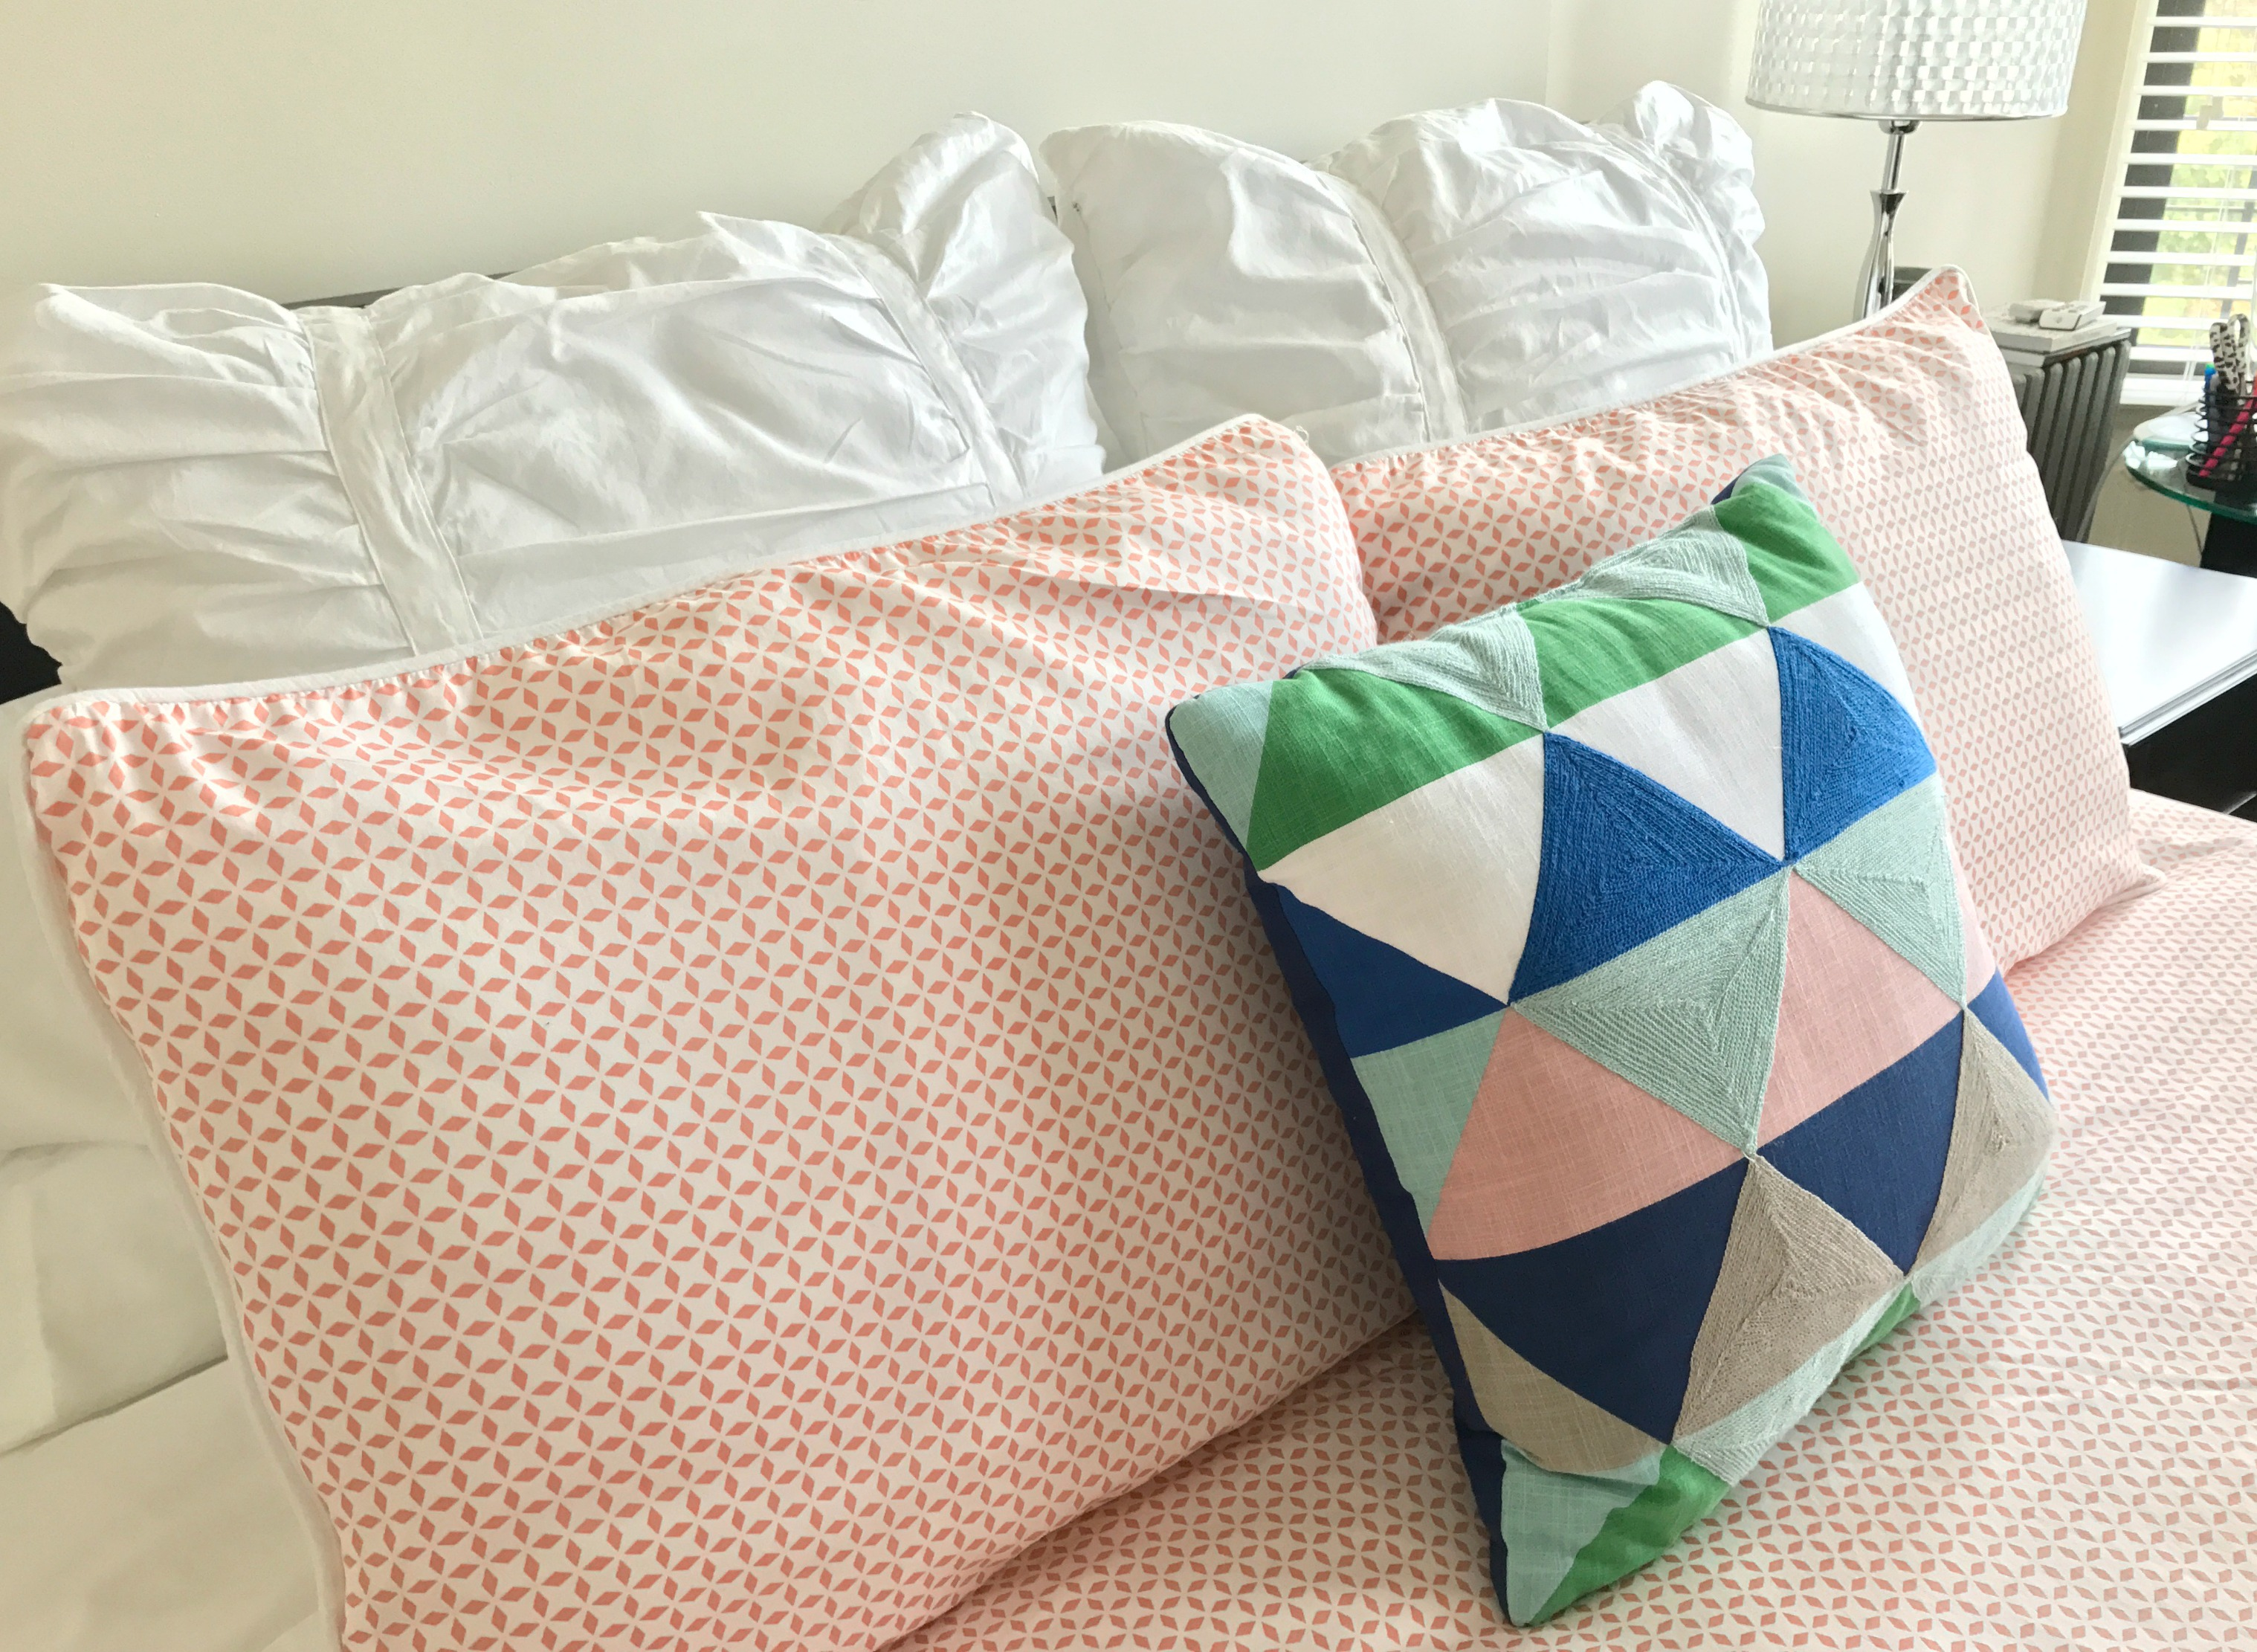 crane-canopy-bedding-target-throw-pillow